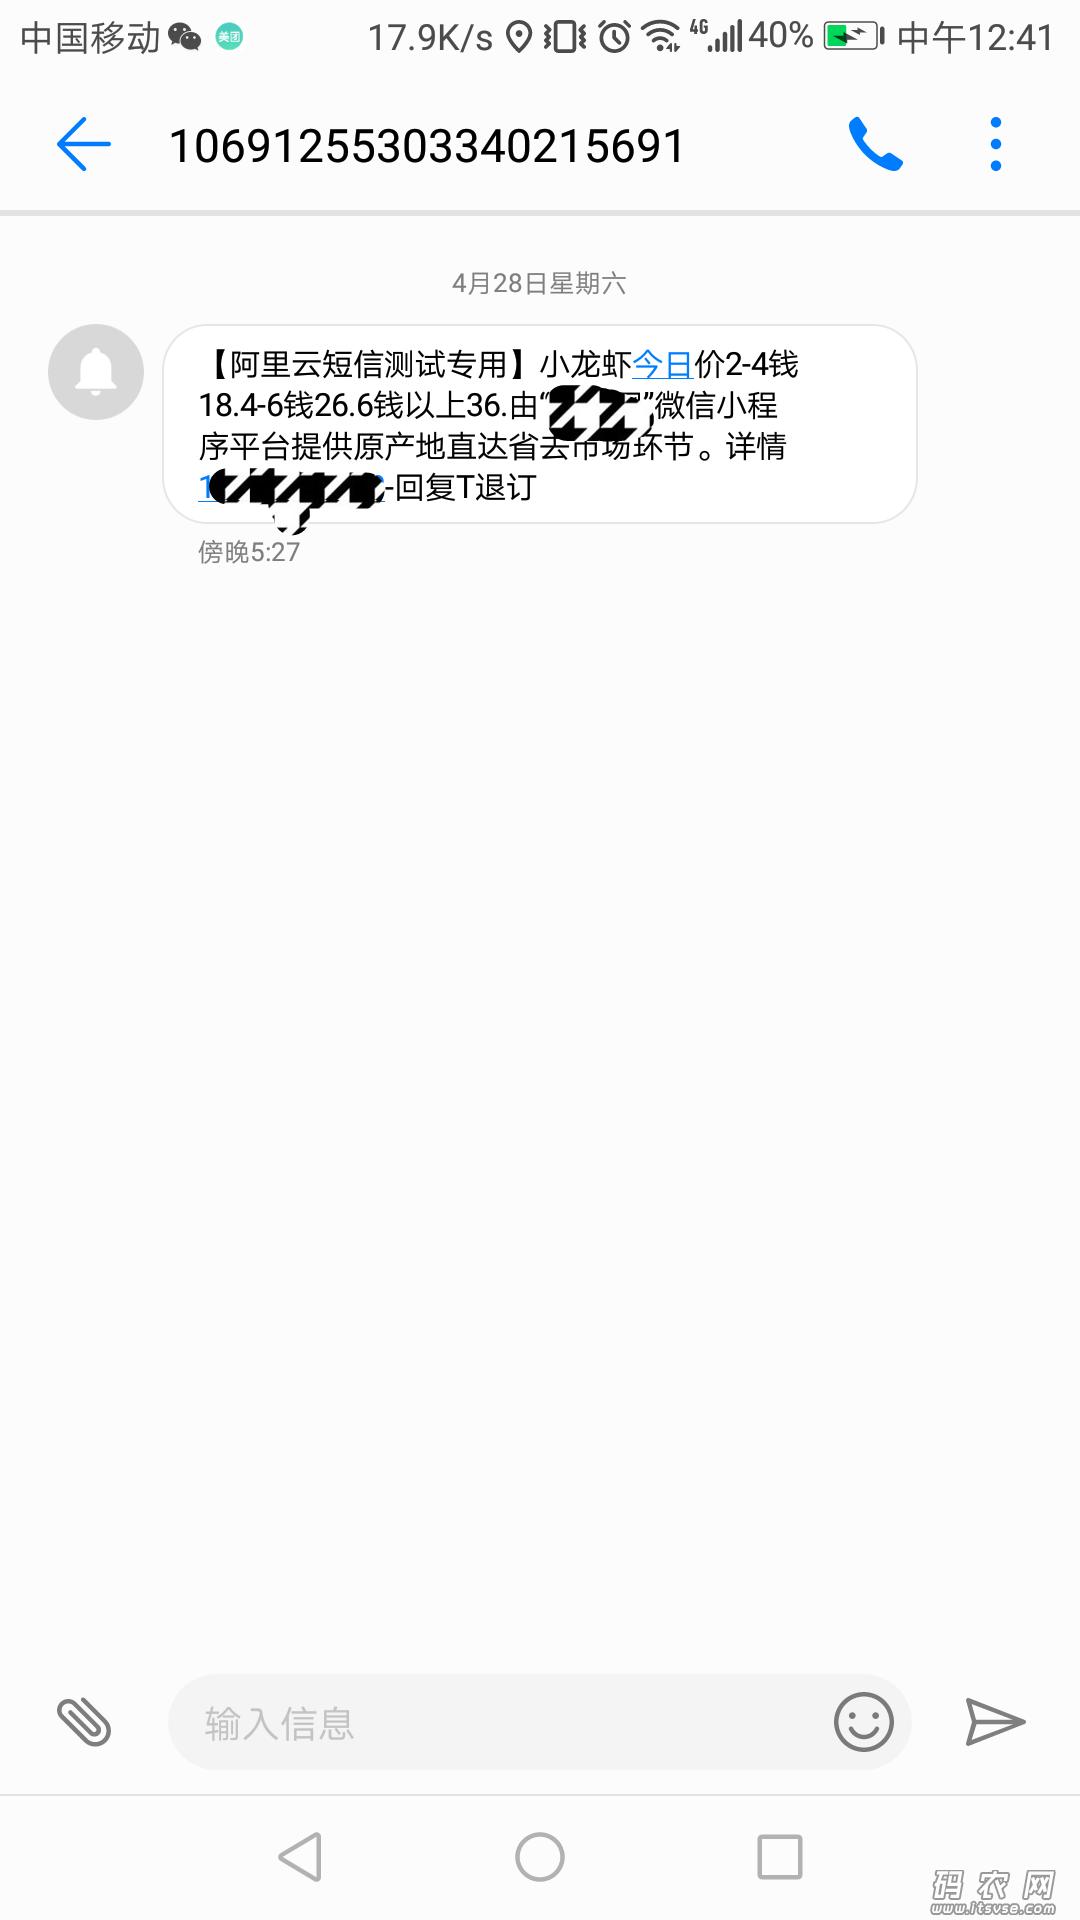 QQ图片20180430124404.png